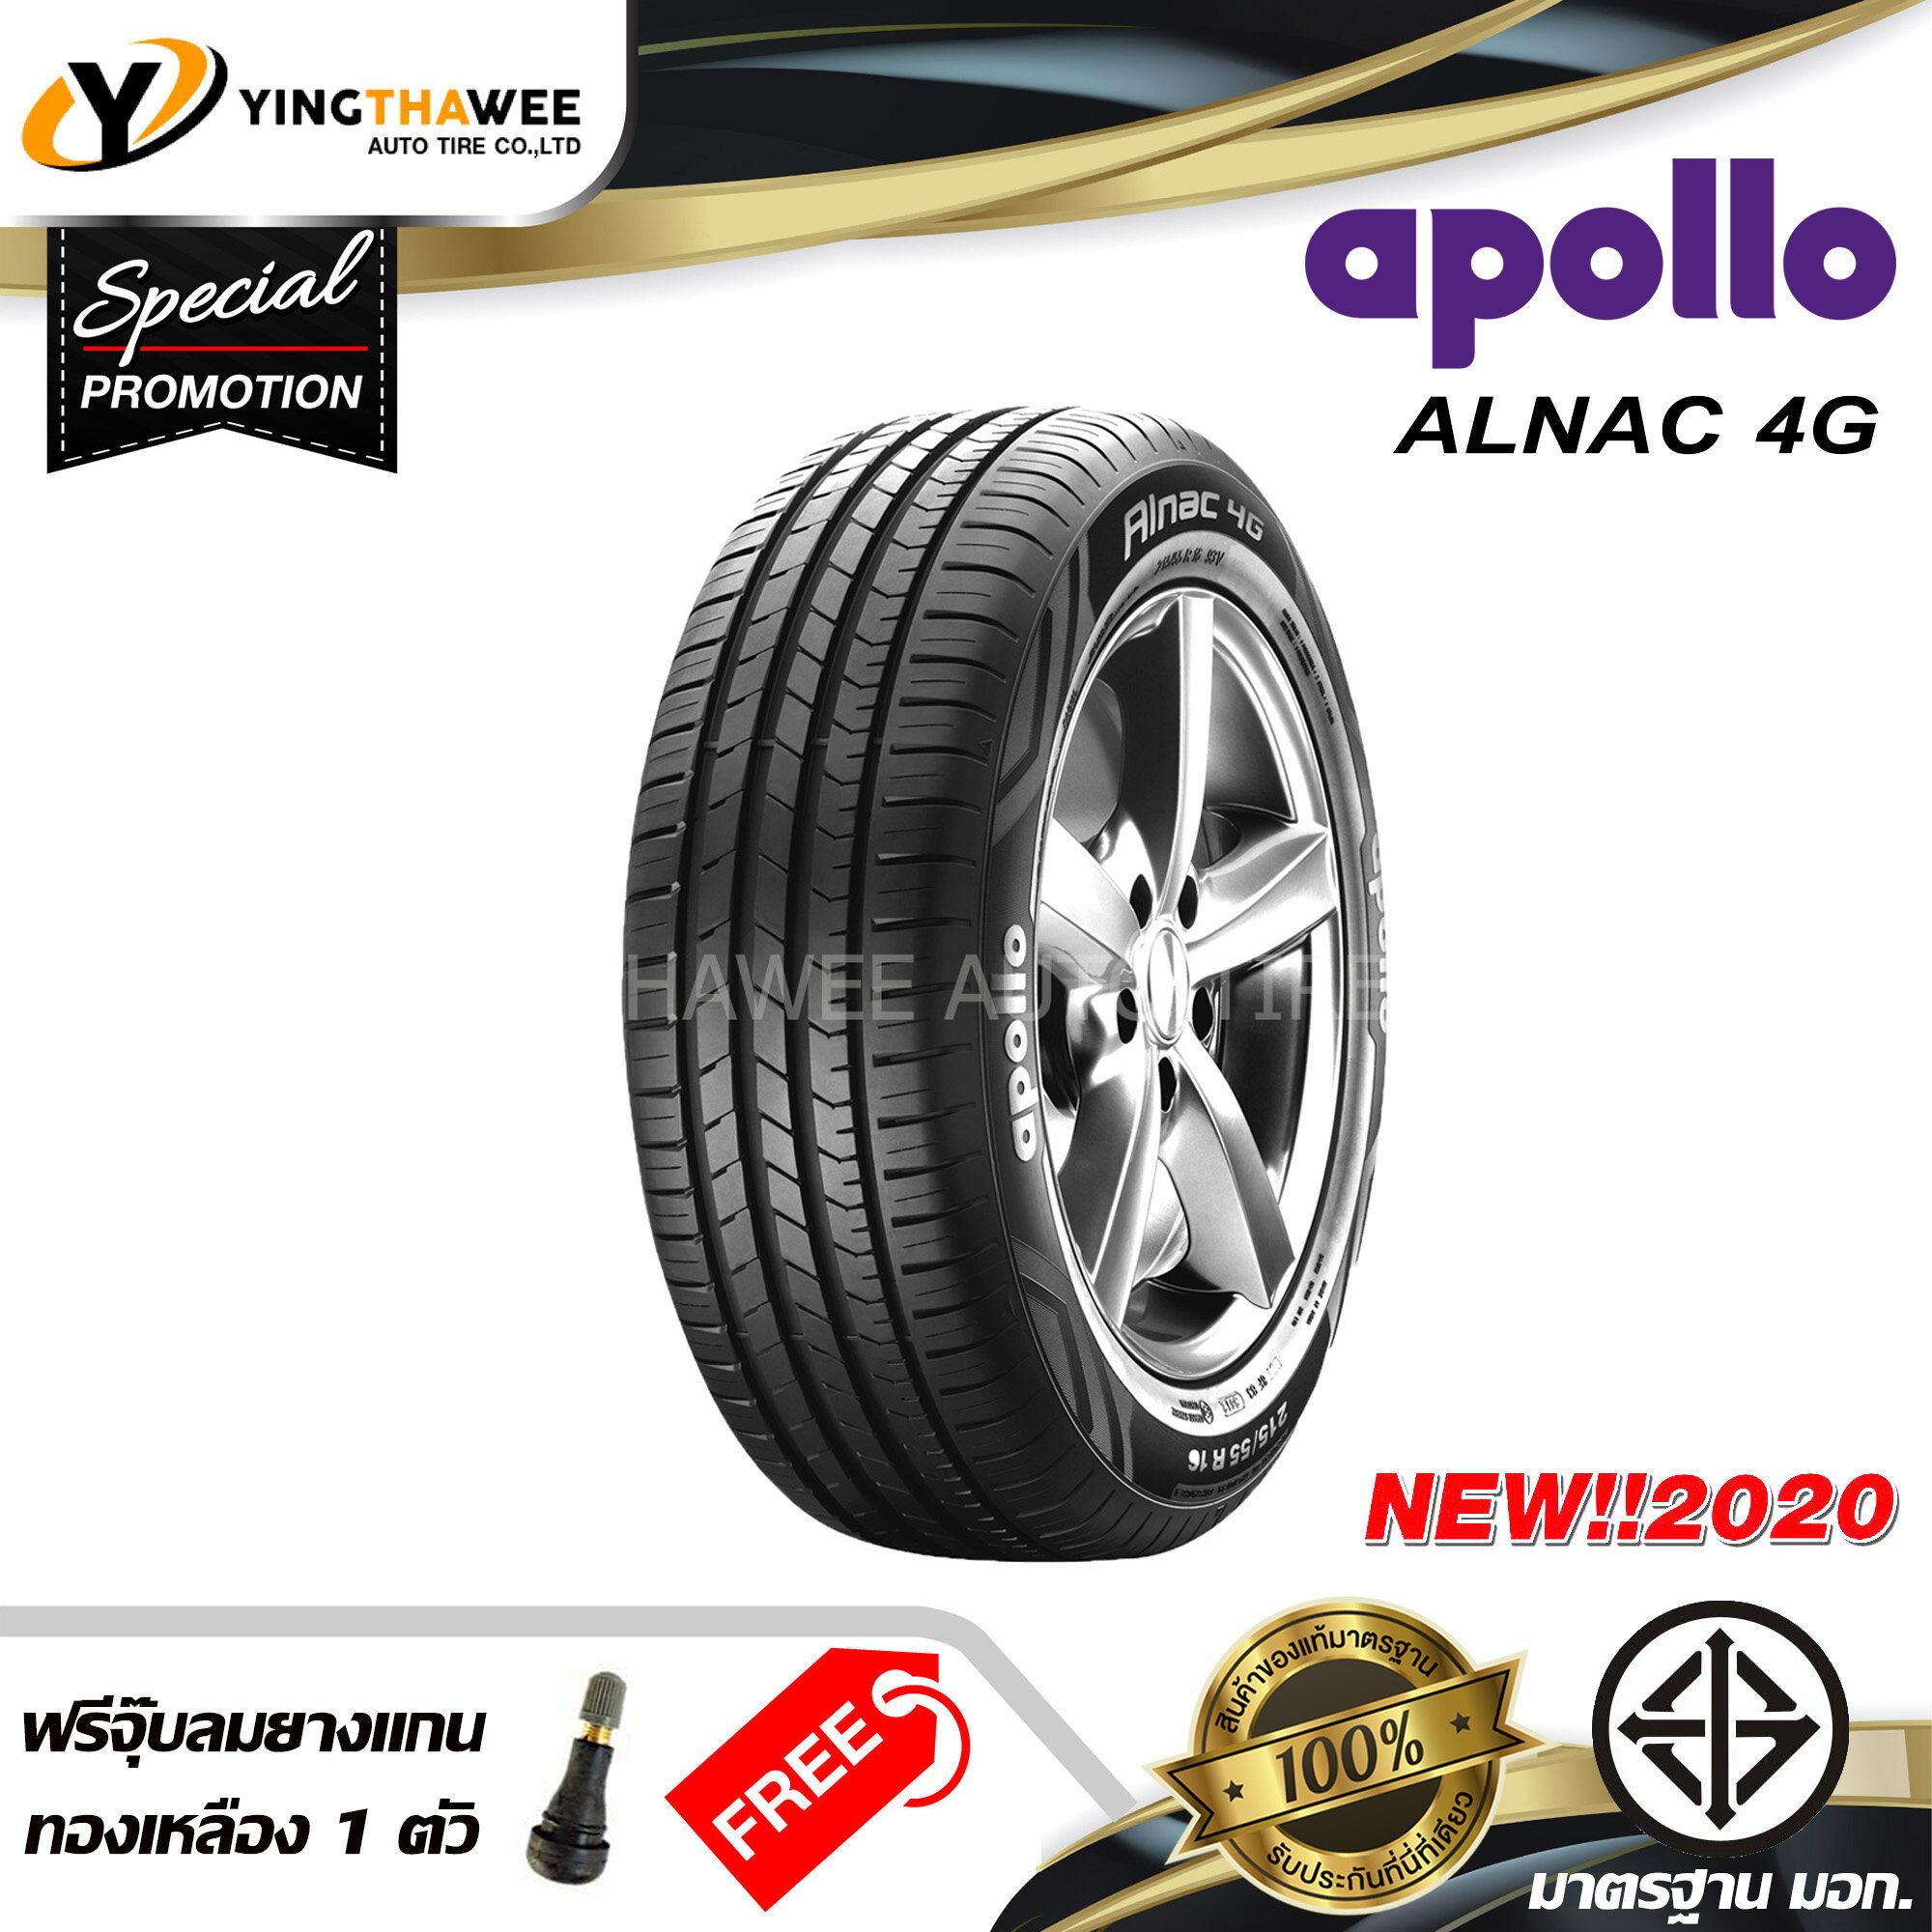 Apollo ยางรถยนต์ 195/50r16 รุ่น Alnac 4g  1 เส้น (ปี 2020) แถมจุ๊บลมยางแกนทองเหลือง 1 ตัว.